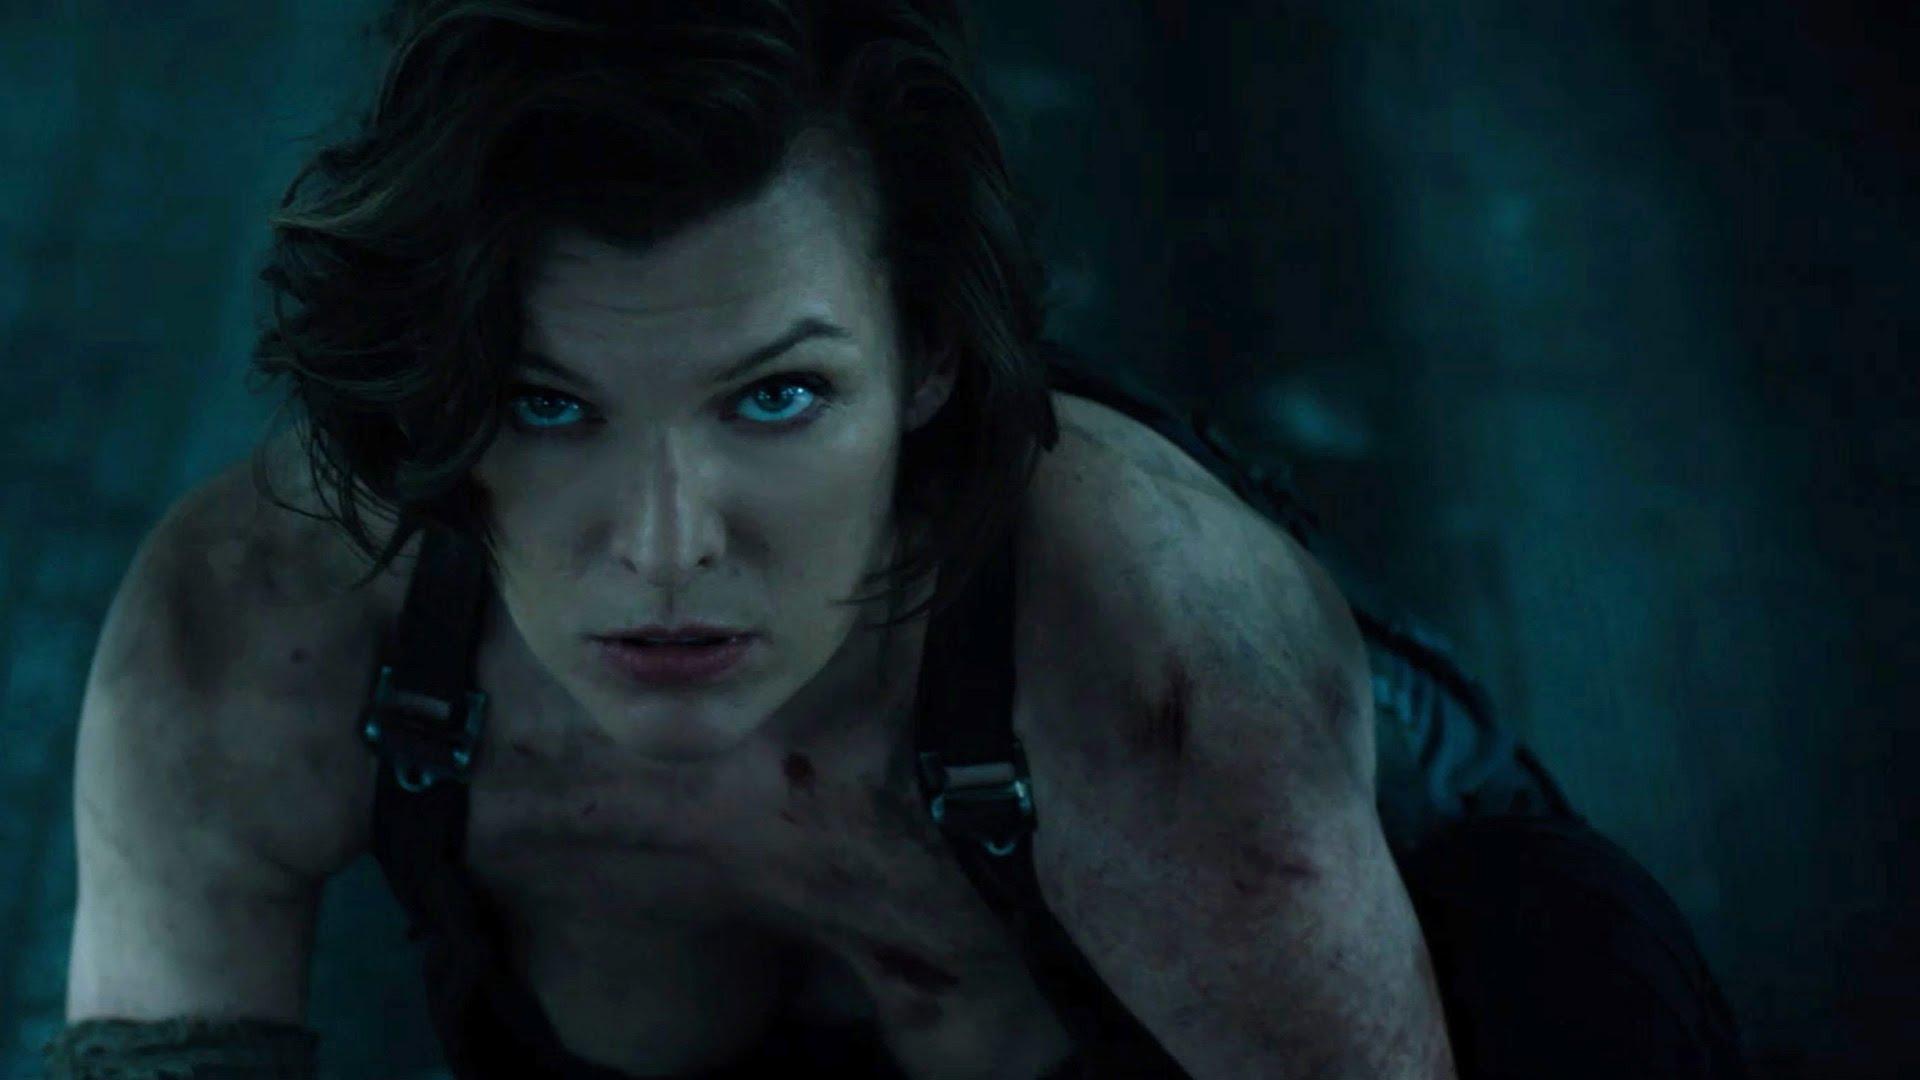 Resident Evil The Final Chapter 2016 Movie Hd Wallpaper: 2 ตัวอย่าง และ 2 ใบปิดใหม่ของ Resident Evil: The Final